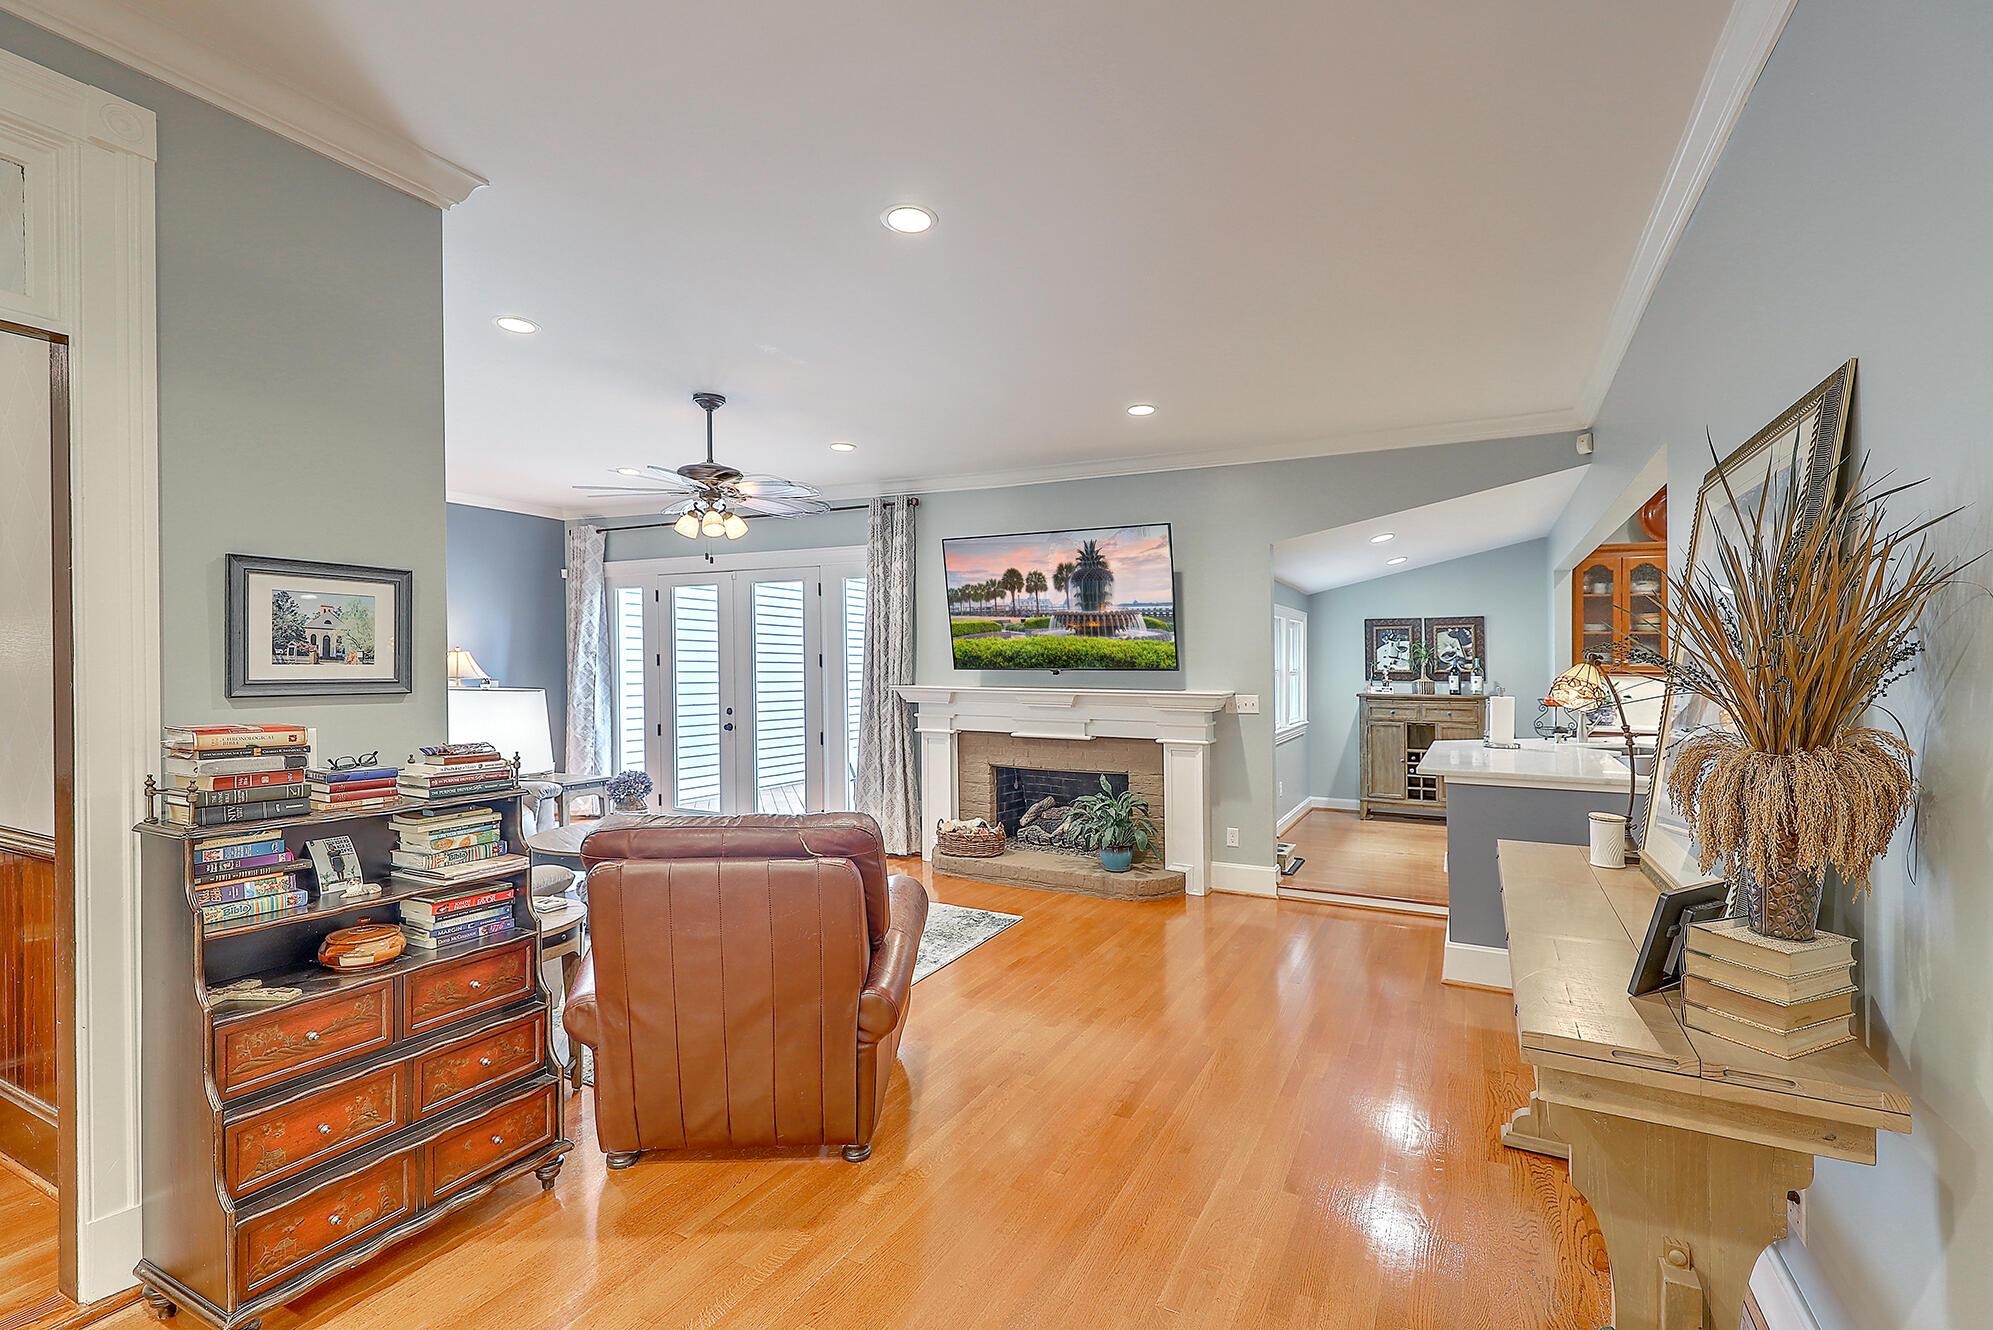 Summerville Homes For Sale - 102 Hickory, Summerville, SC - 58